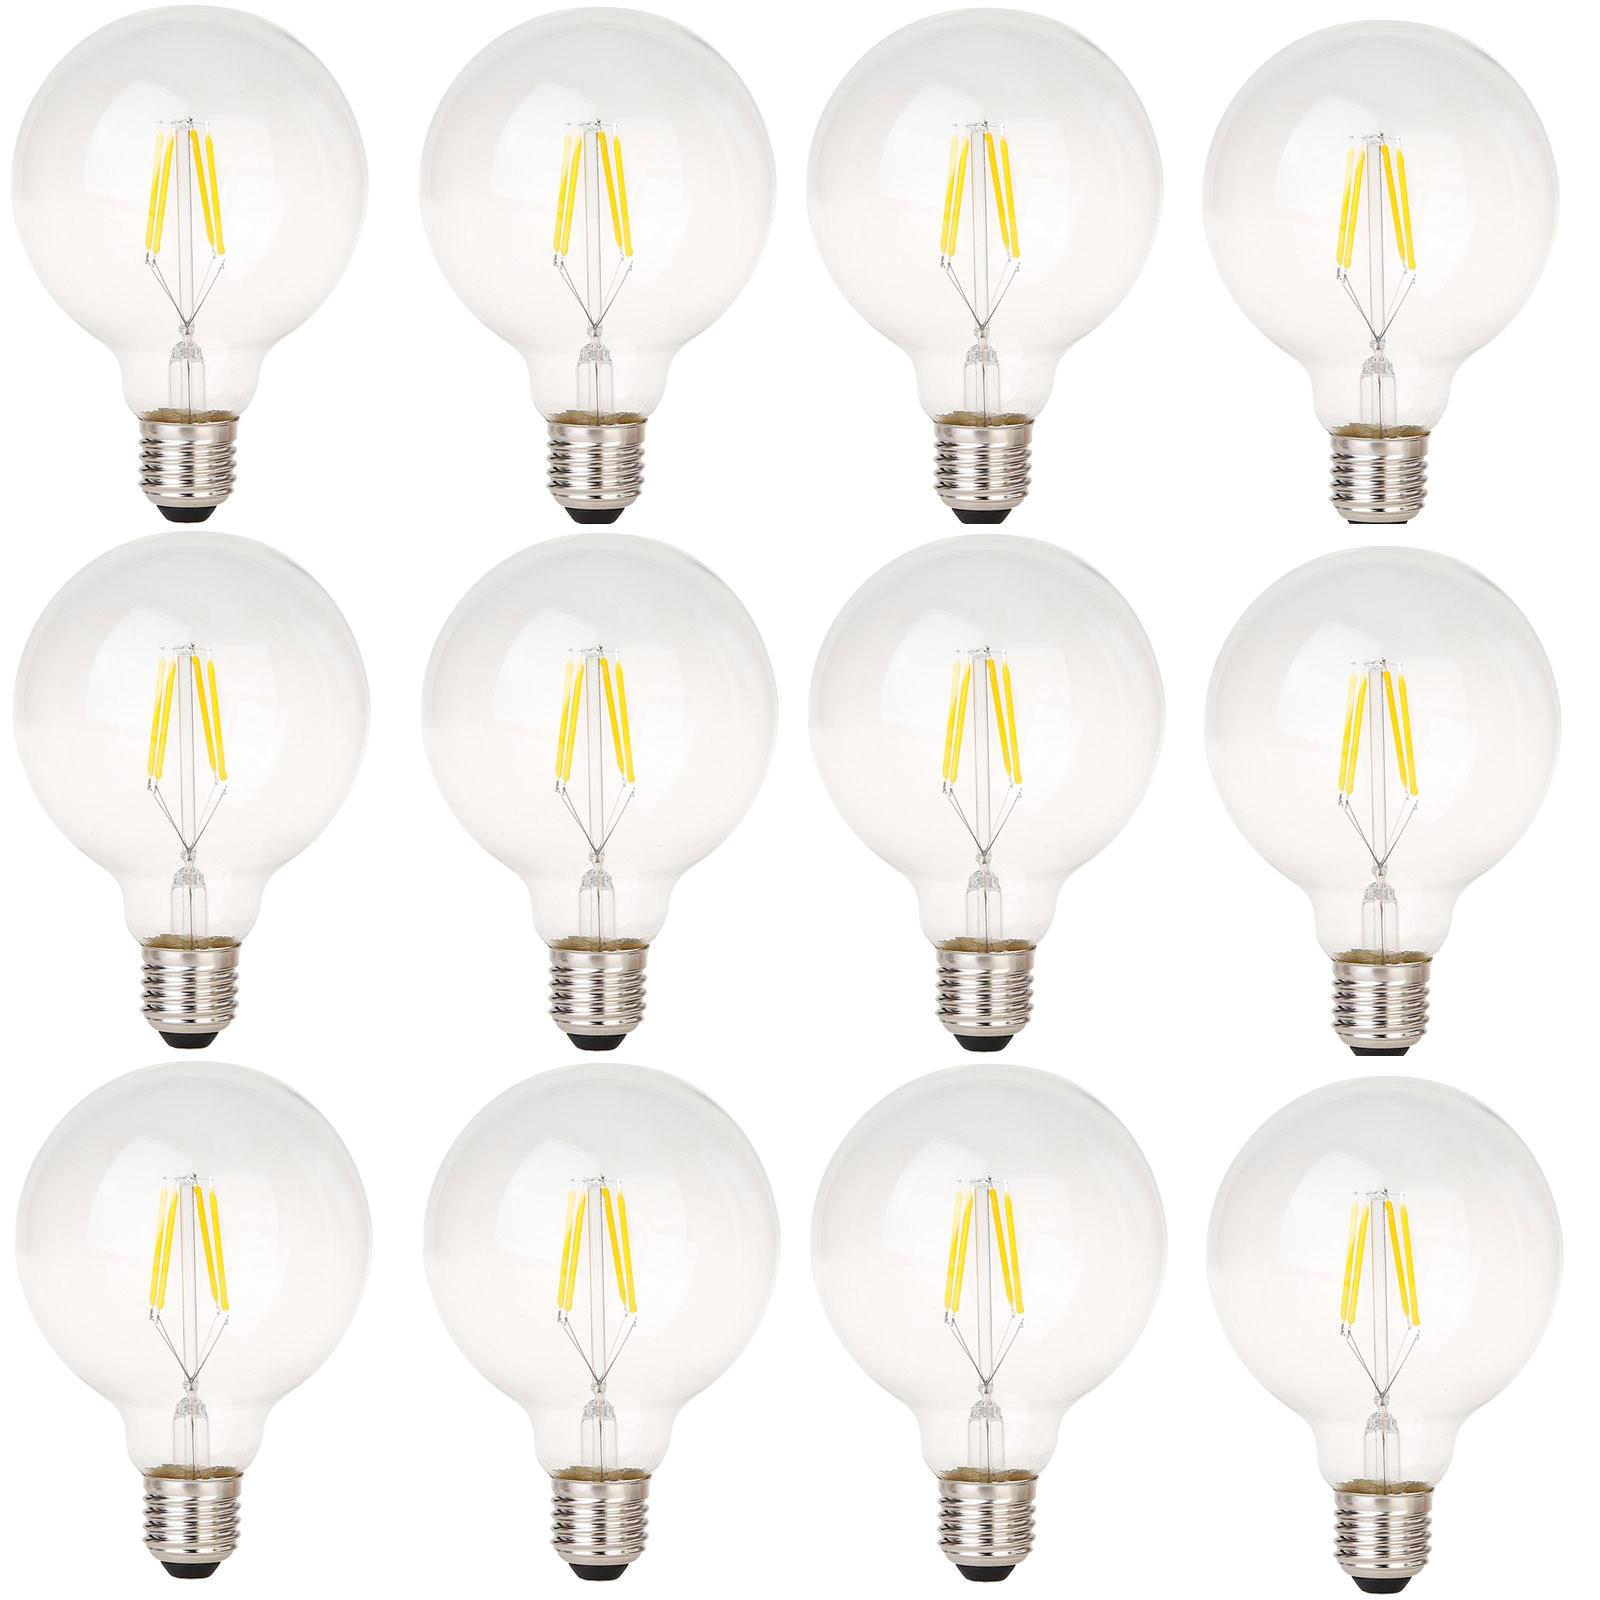 12x Vintage bombillas LED de filamento G95 4W E27 Retro Edison tornillo estilo LED Bombilla de vidrio transparente cubierta cálida lámpara blanca 2700K 220V